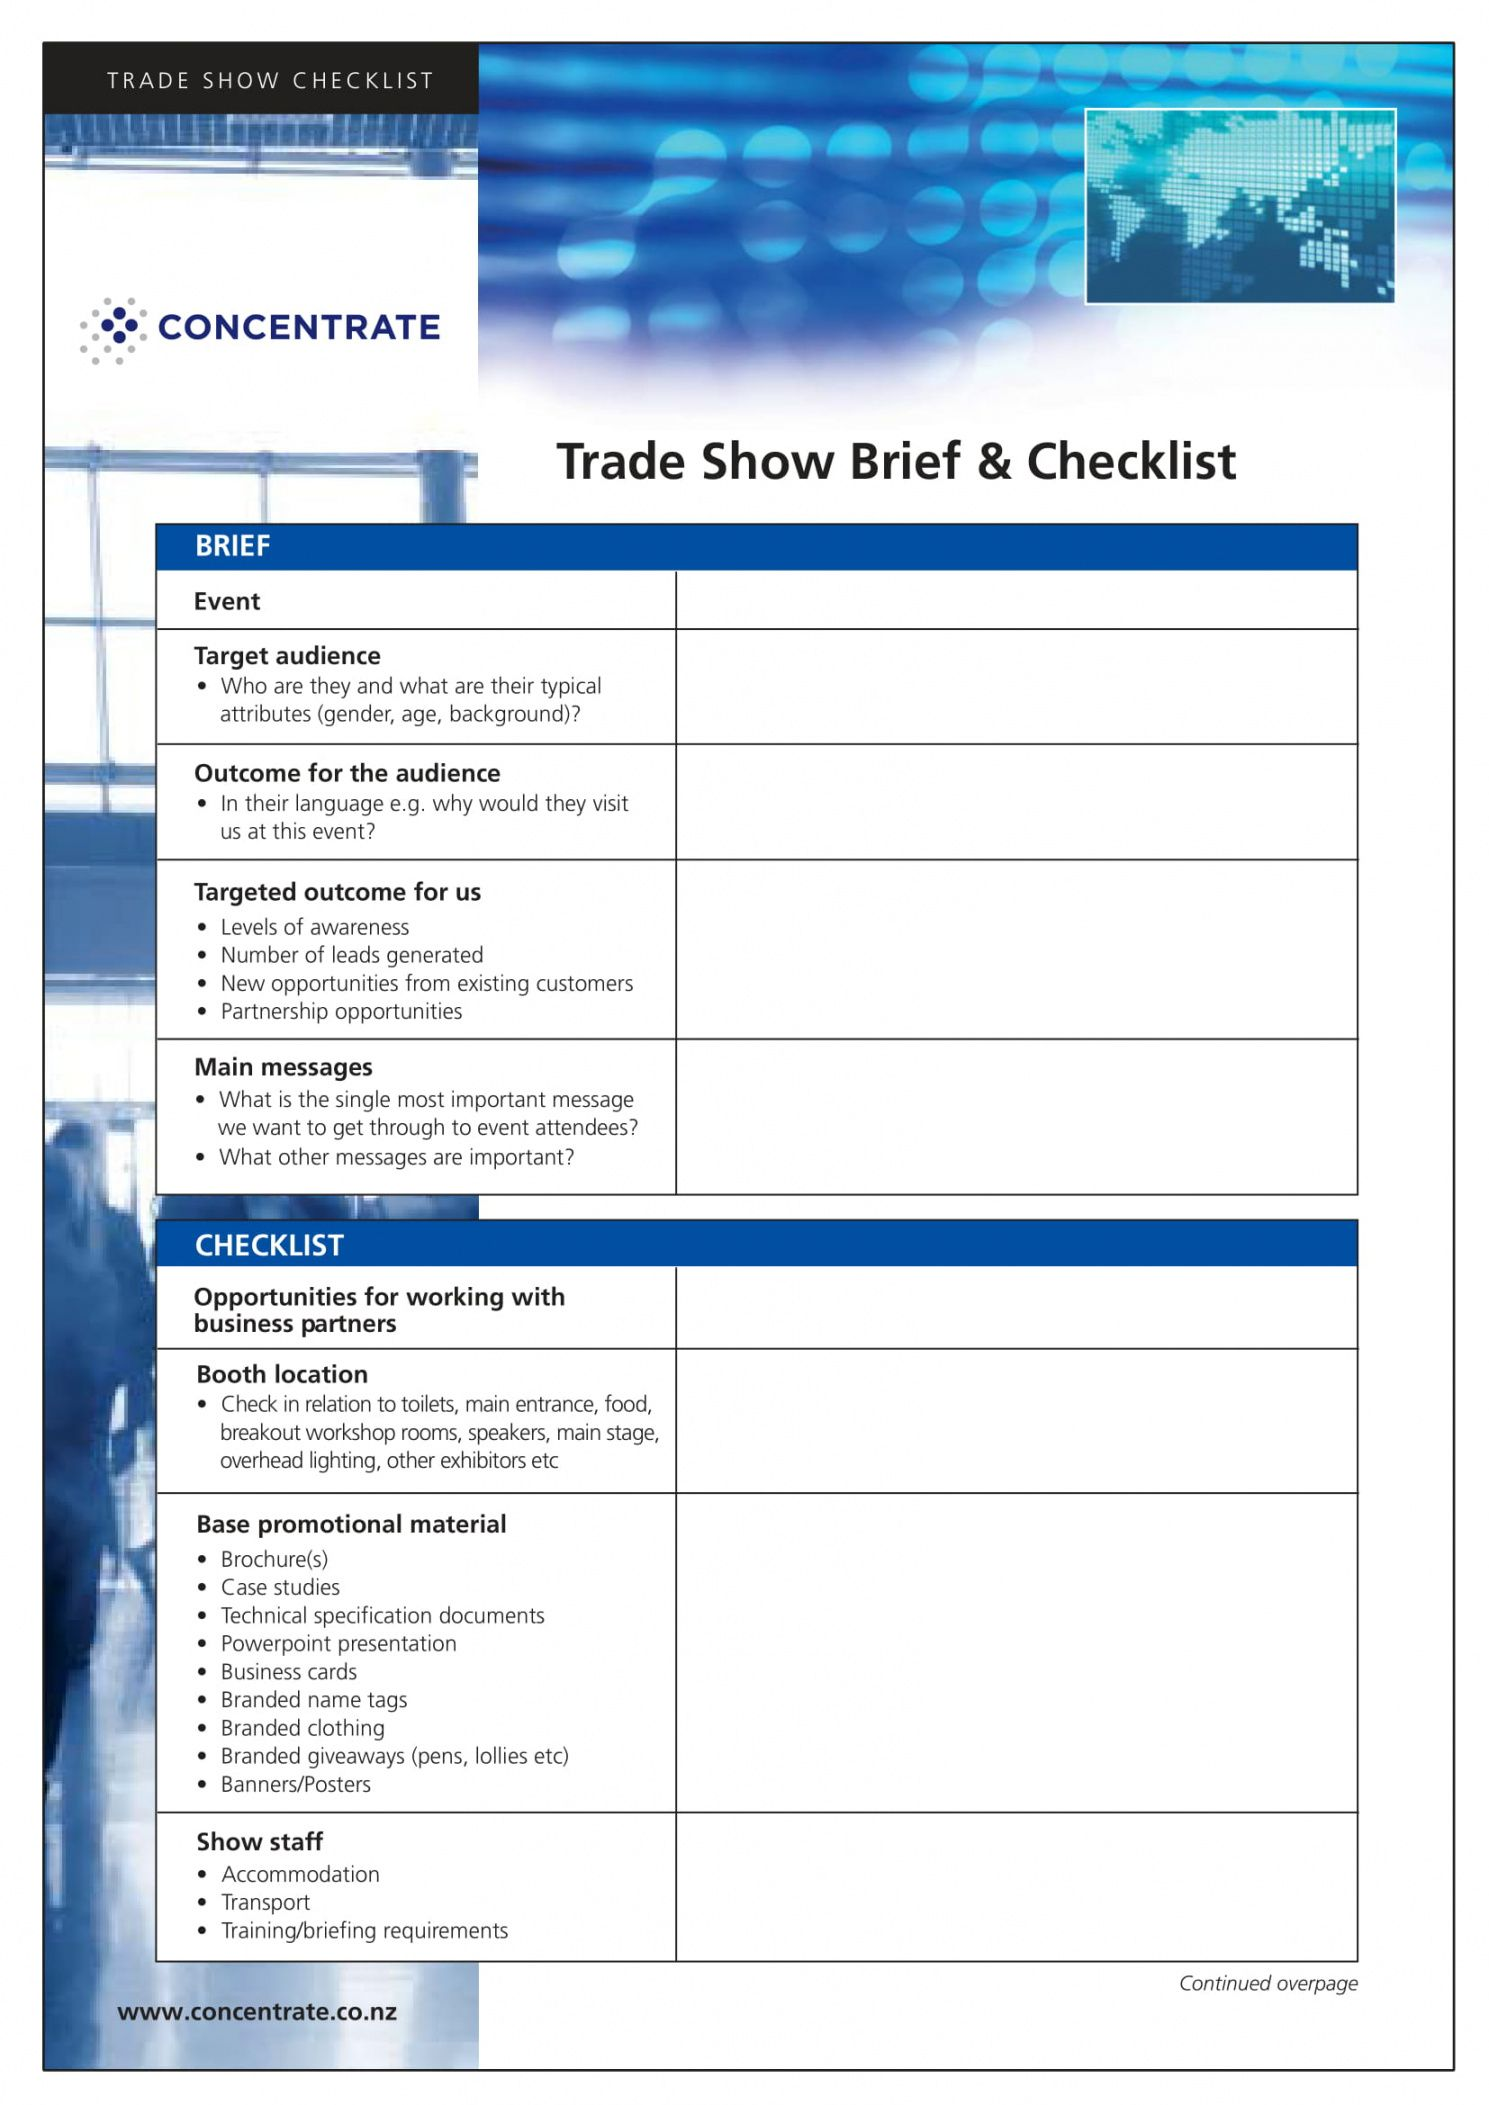 9 trade show checklist examples  pdf  examples trade show checklist template examples